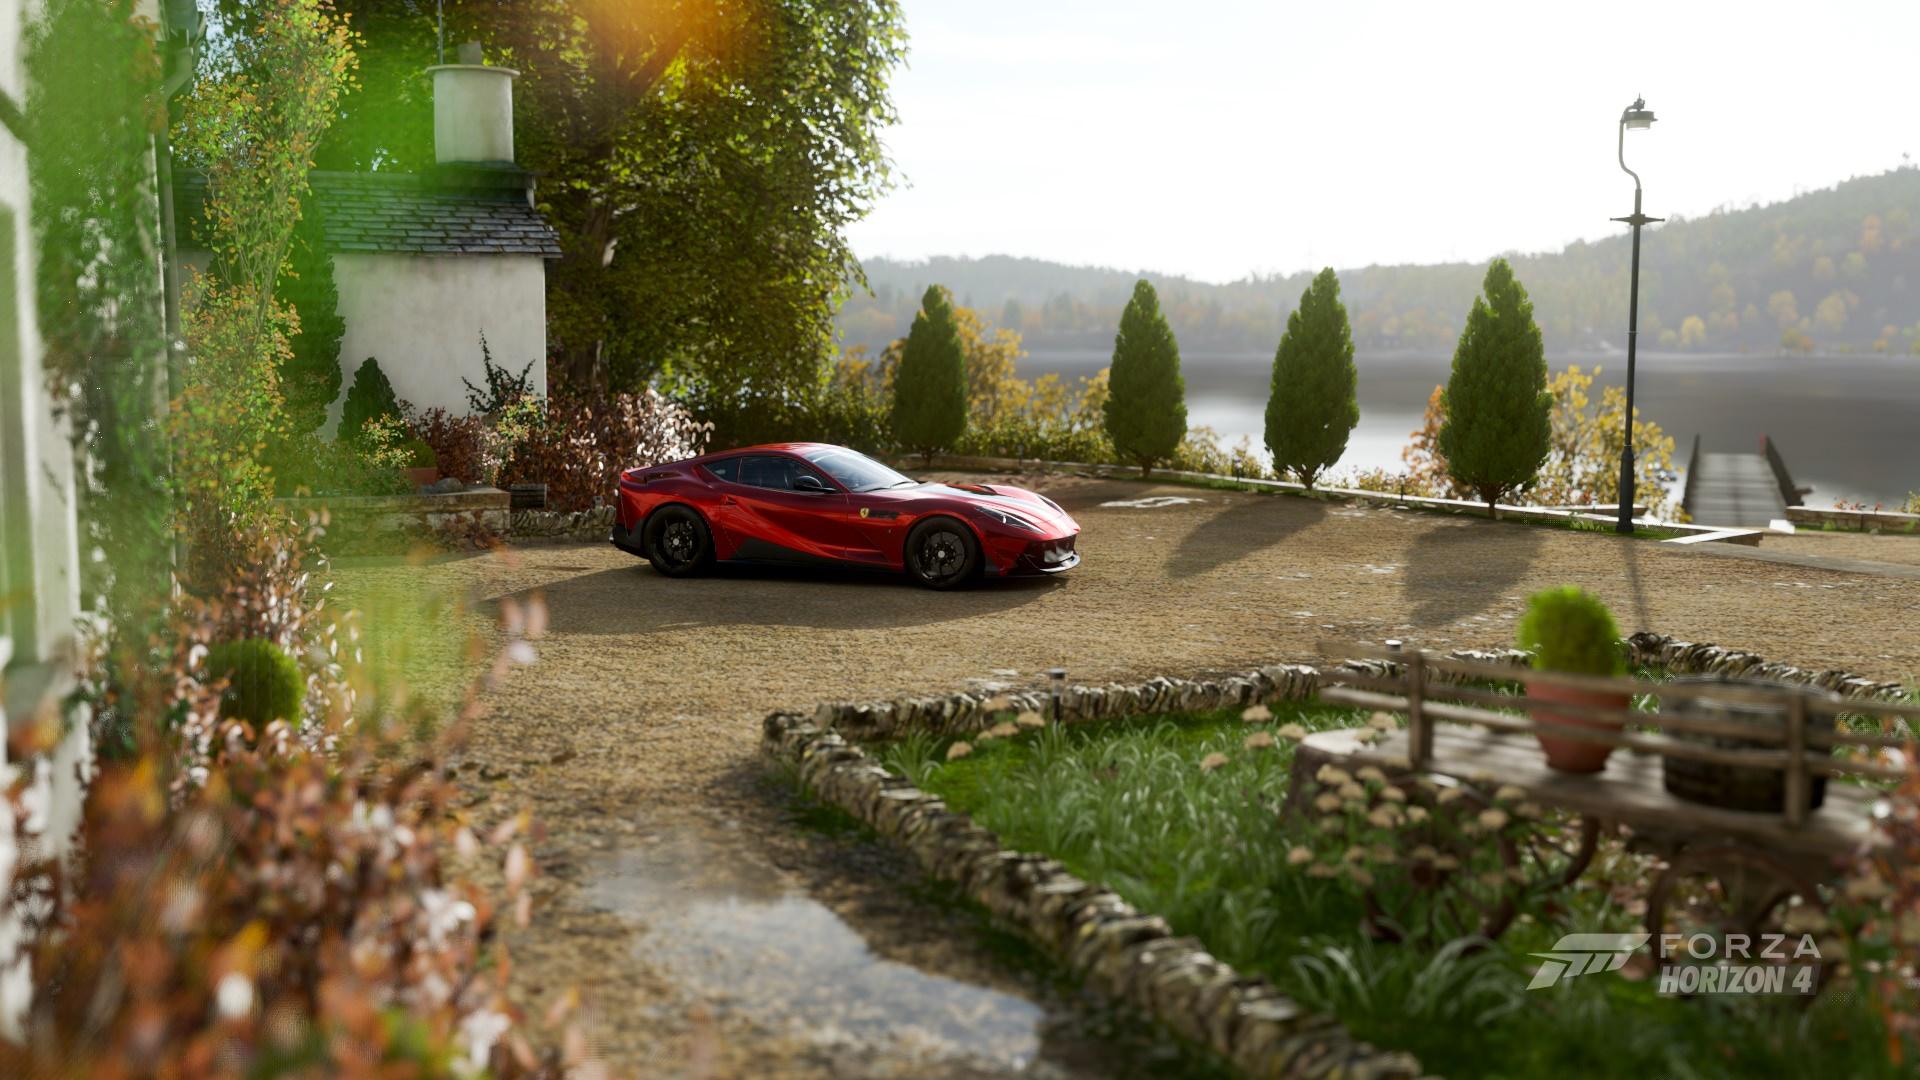 Forza Horizon 4 | Page 4 | [H]ard|Forum